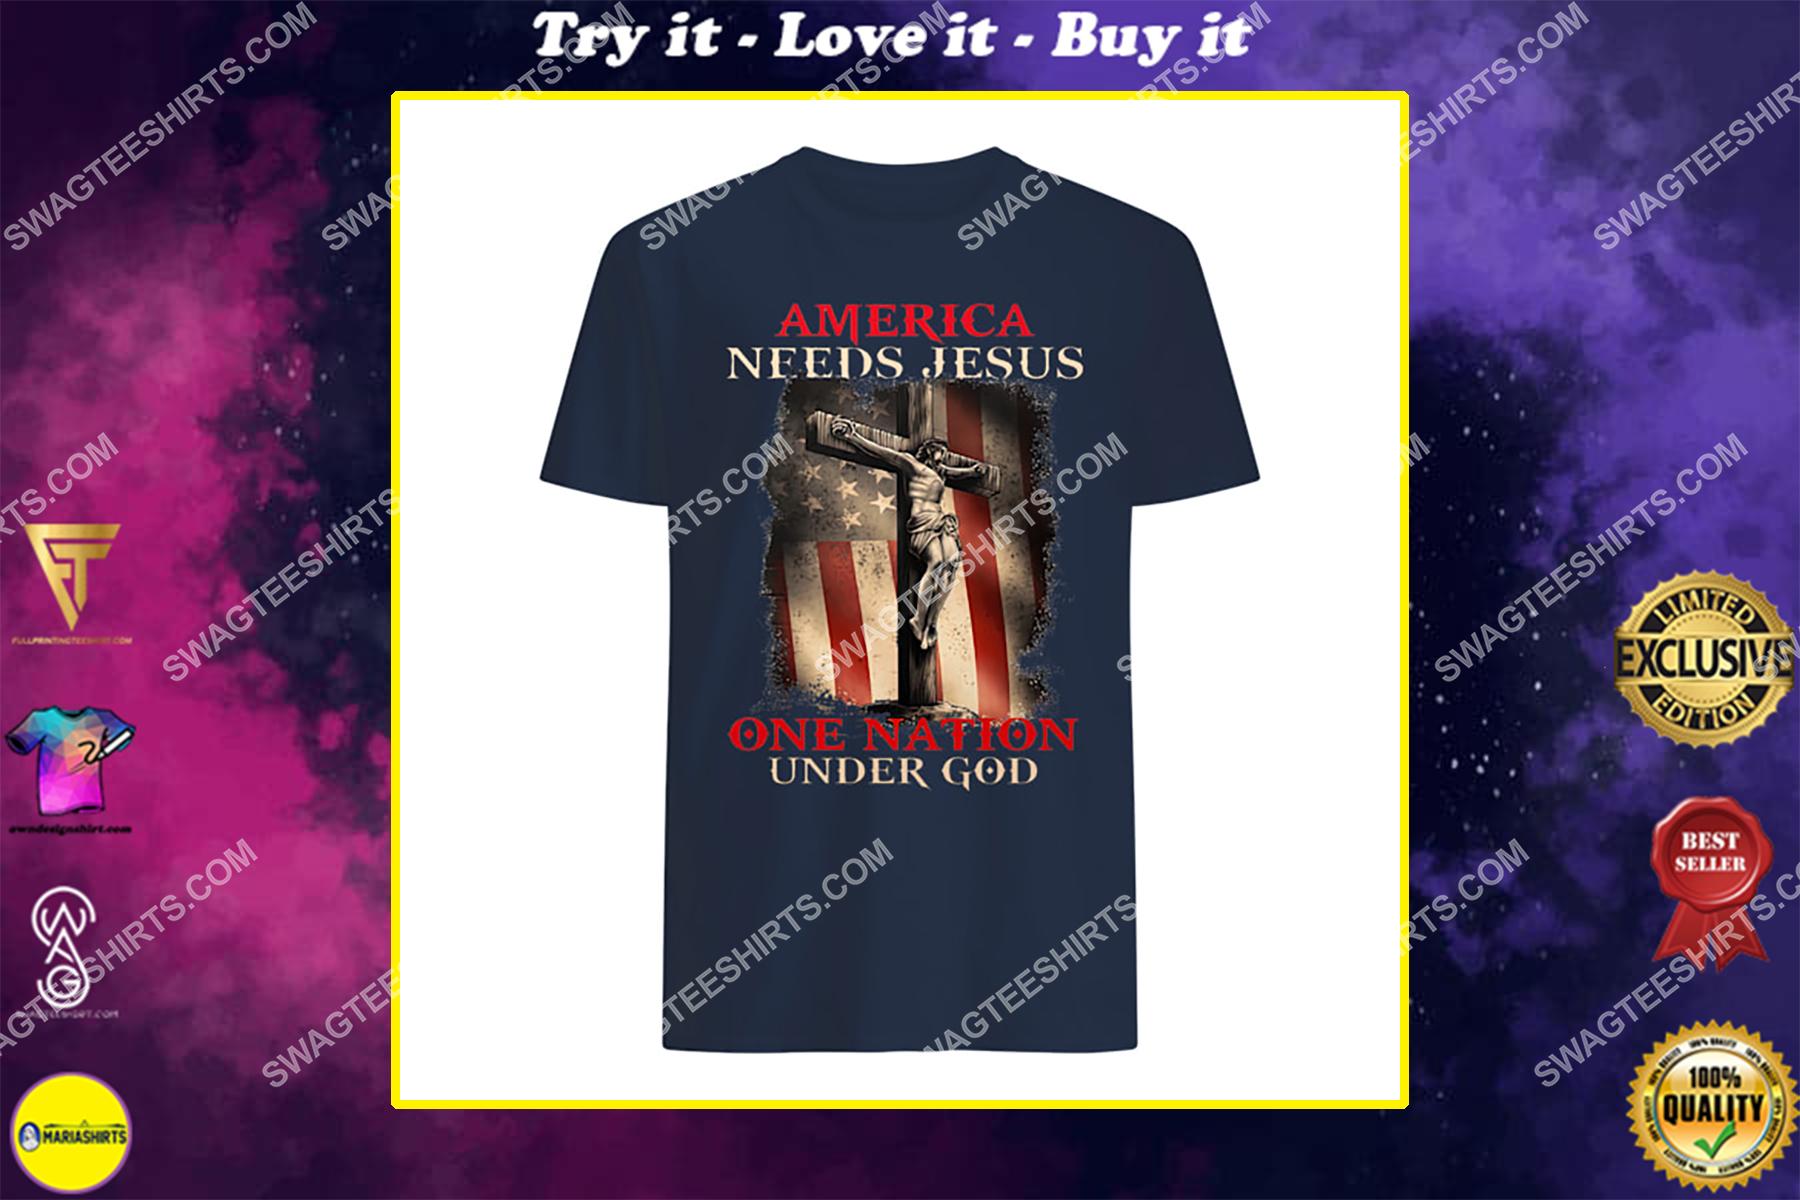 america needs Jesus one nation under God for memorial day shirt